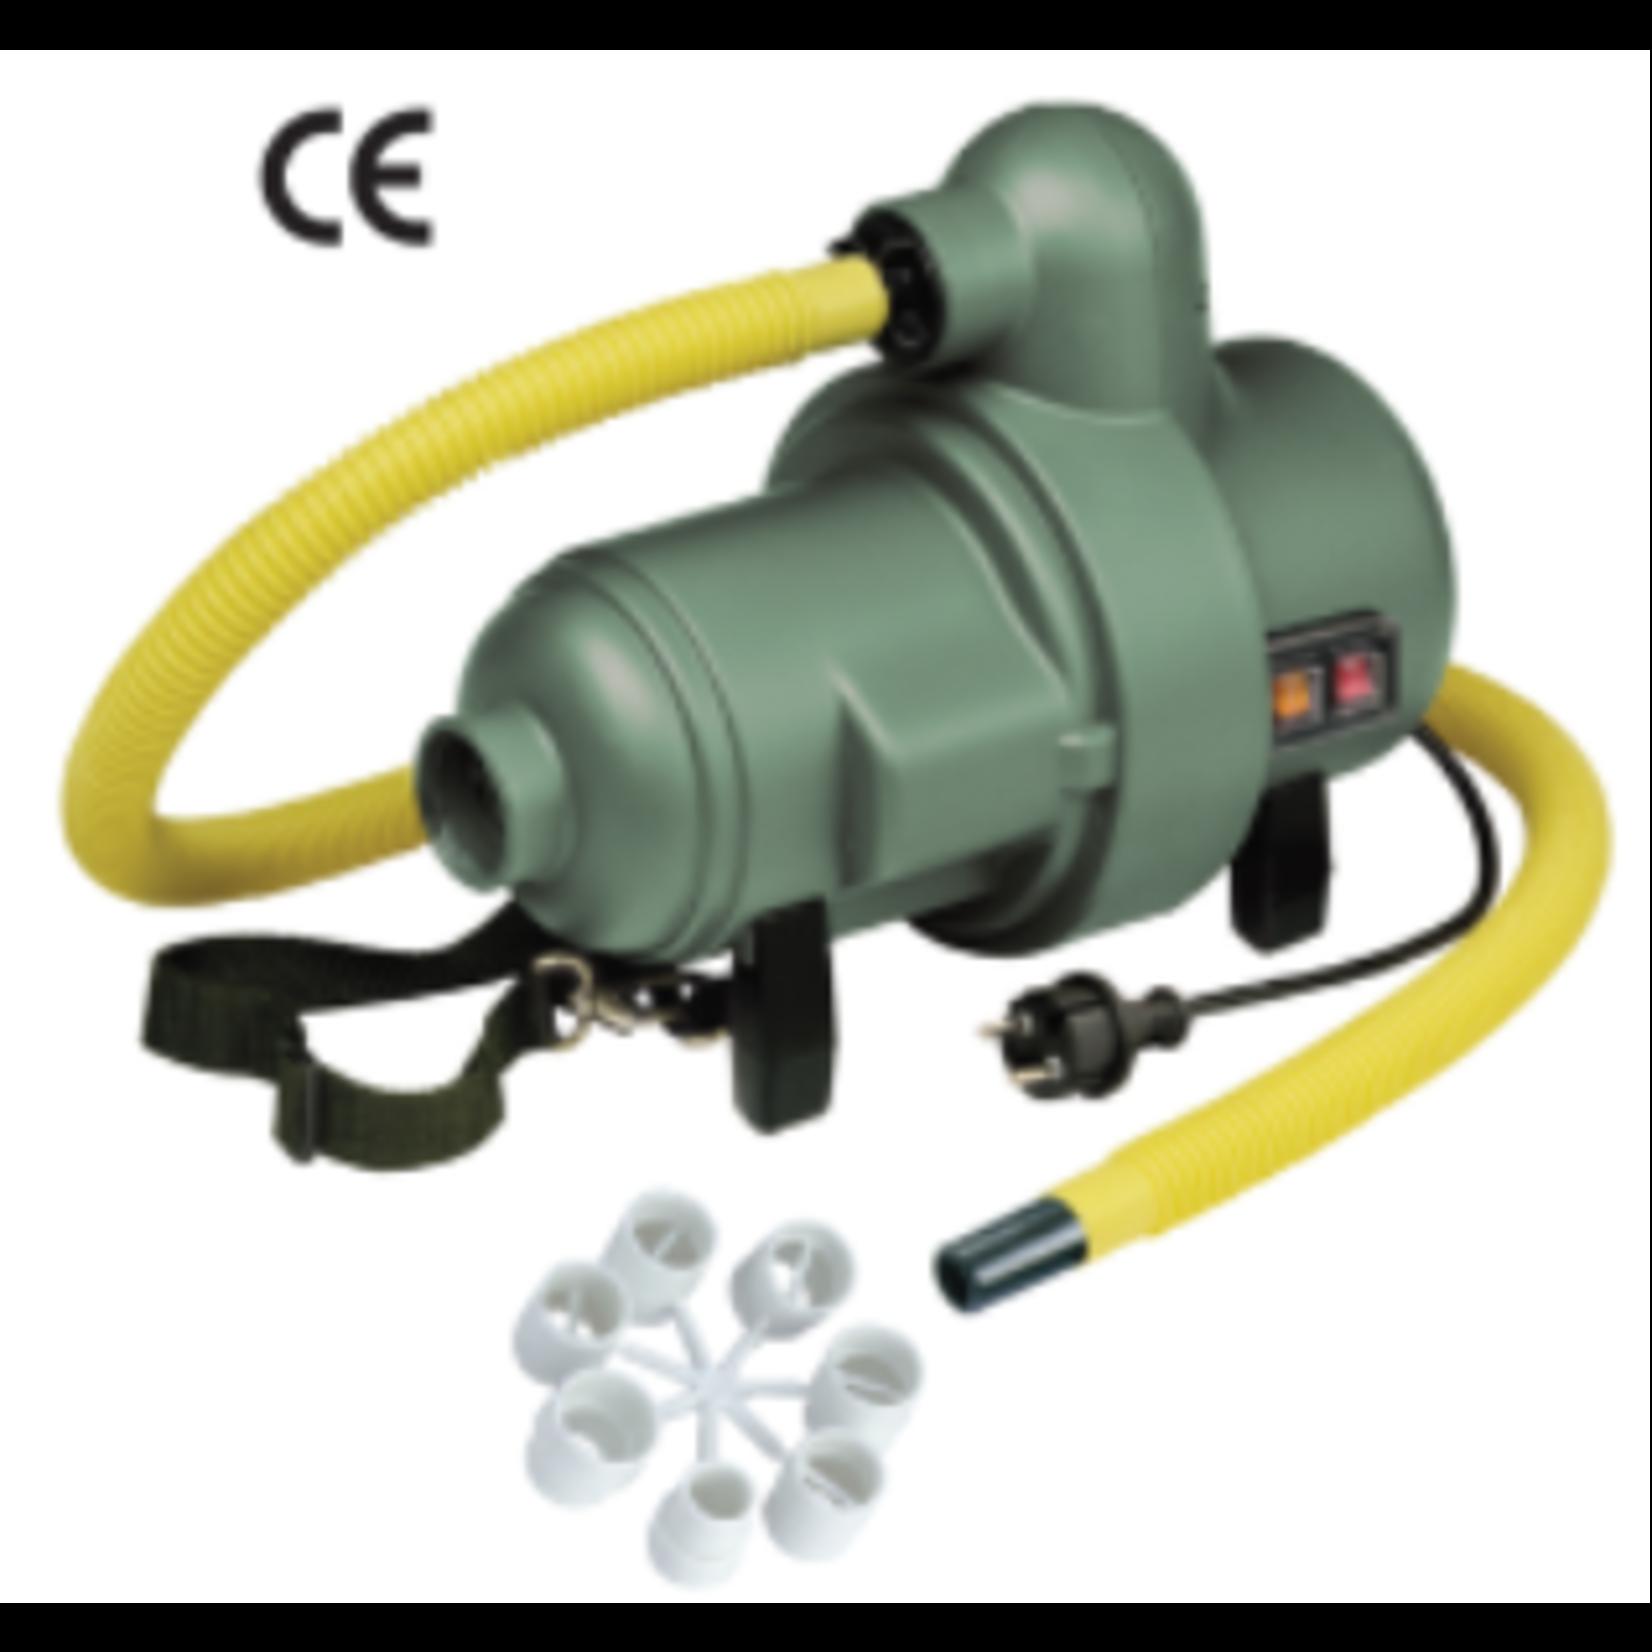 Scoprega Bravo 2000 Electric pump 230V - up to 400 mbar